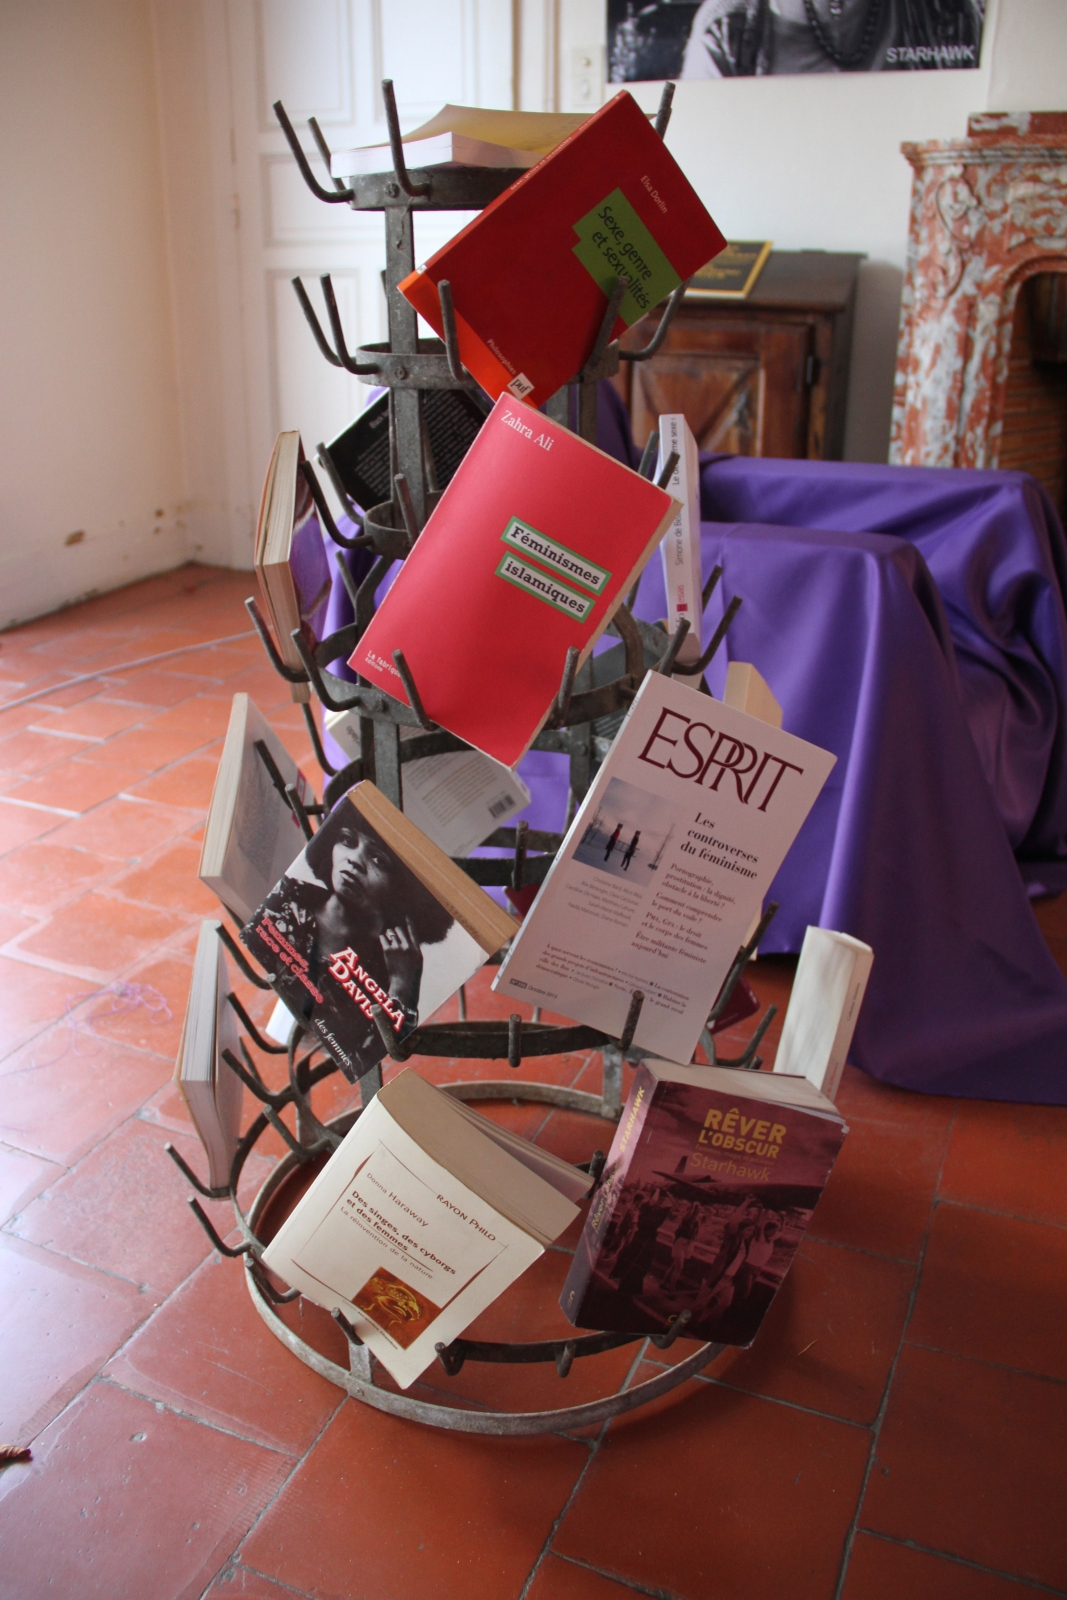 pascal-lievre-afiac-maison-feministe-2015-04